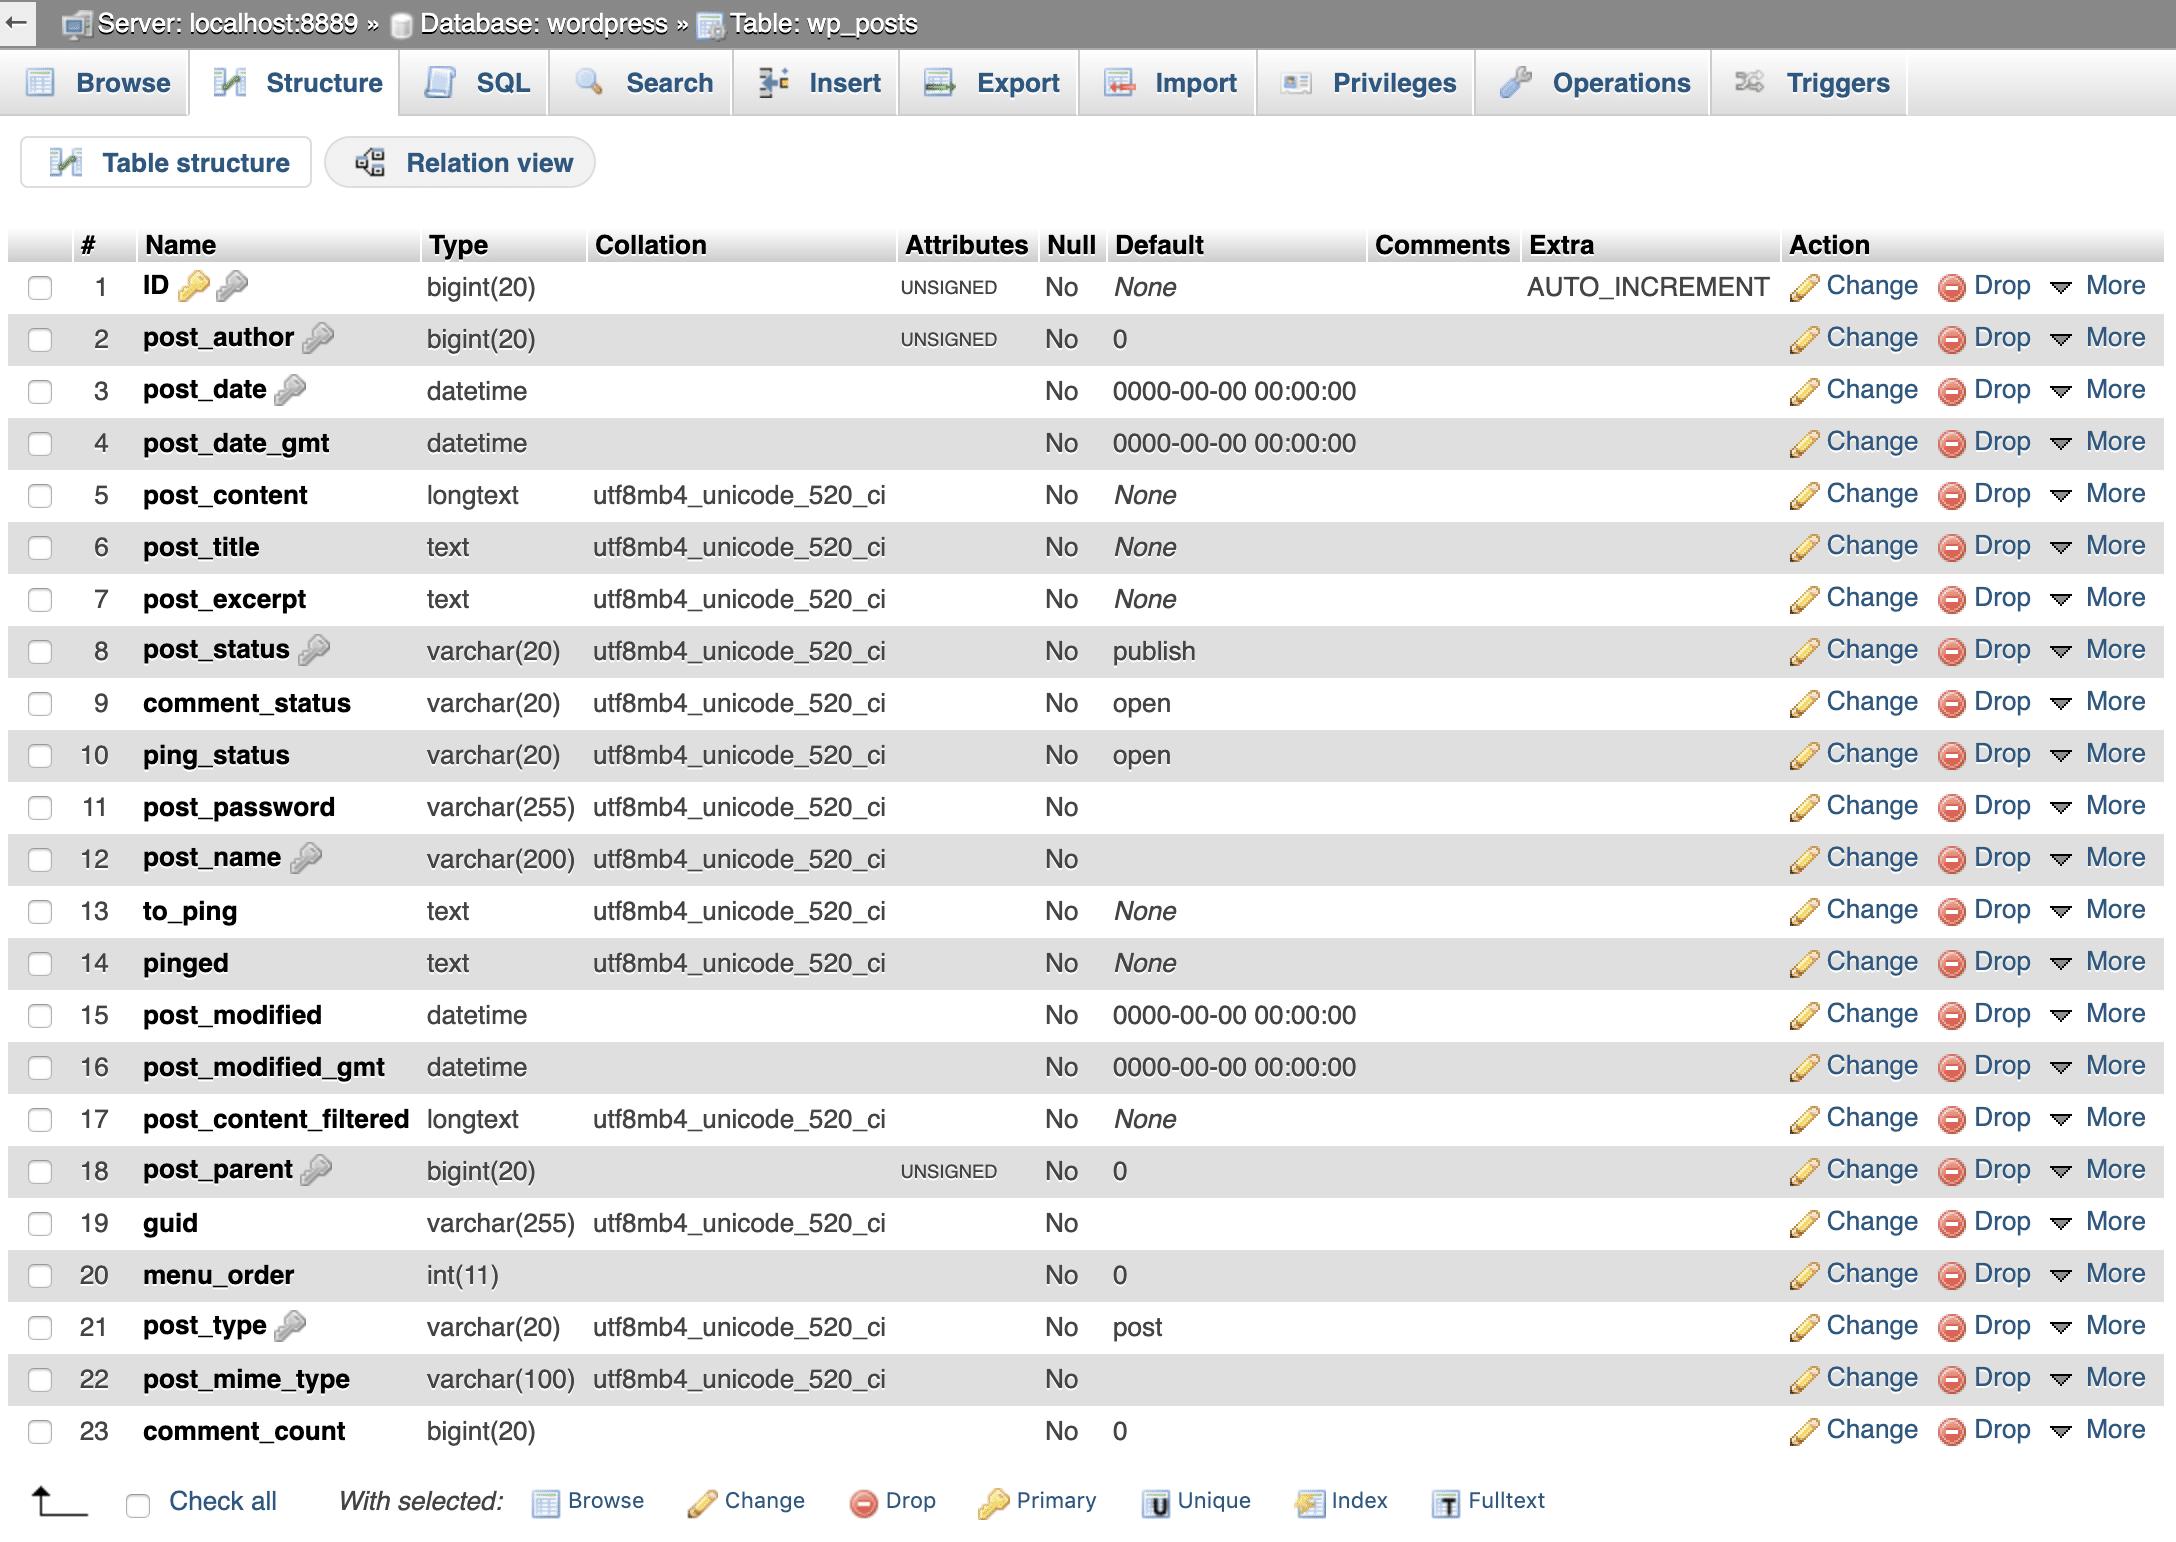 wp_posts Tabellenstruktur in phpMyAdmin